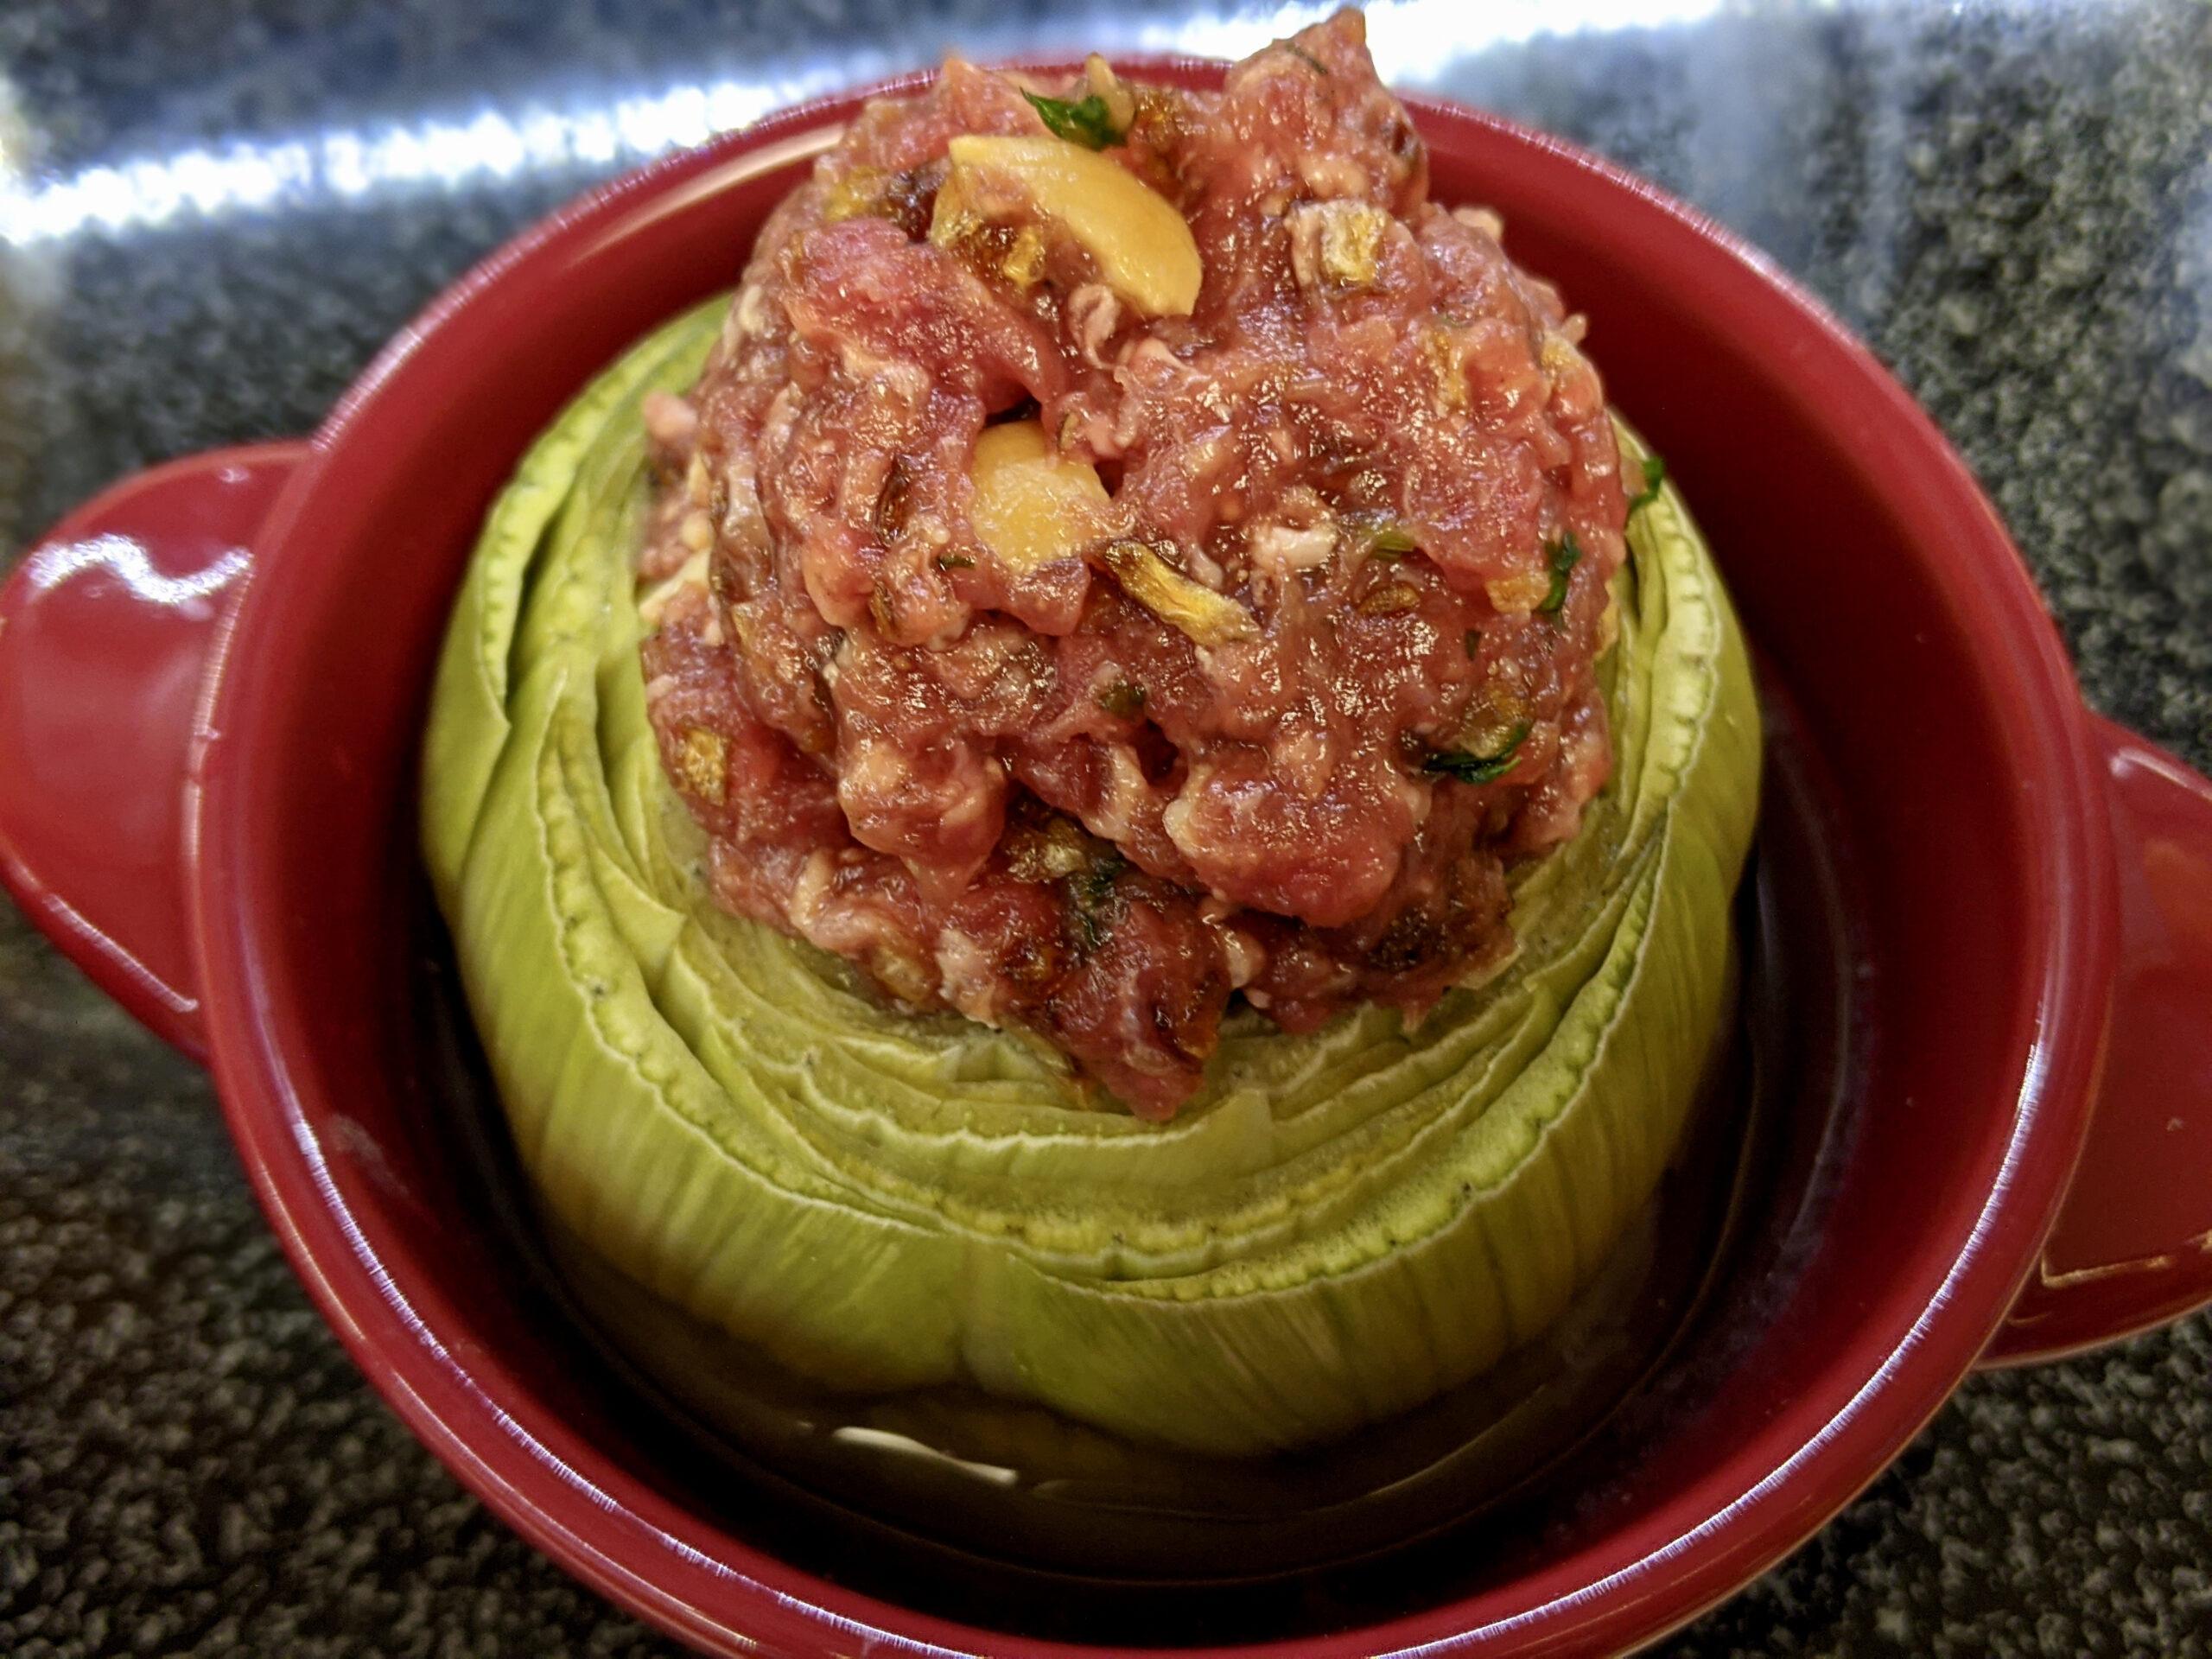 Made In Marrow - Meal 95 - Kharshouf Maahshi - Artichoke Bottoms Stuffed with Meat